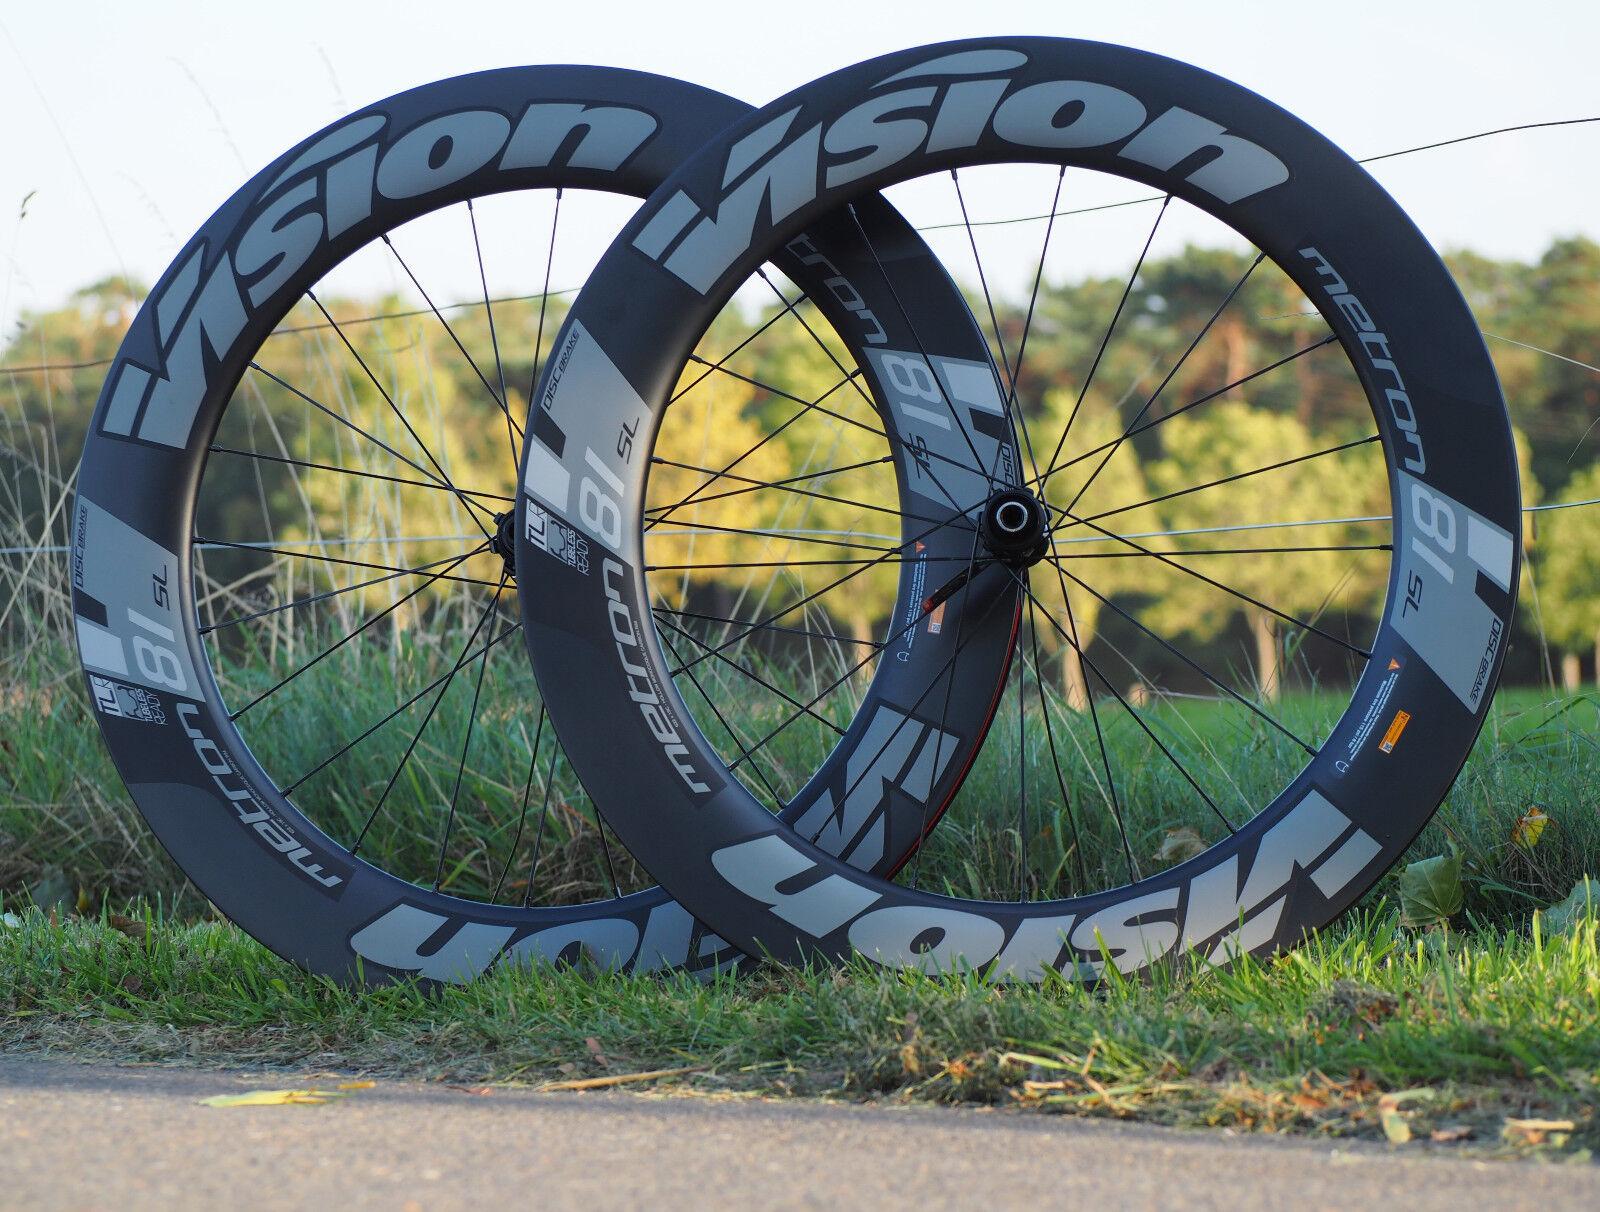 Giant Propel Disque Vision Metron 81 Wheelkit, Giant Propel Propel Propel 2019, Giant Vélos b79db0